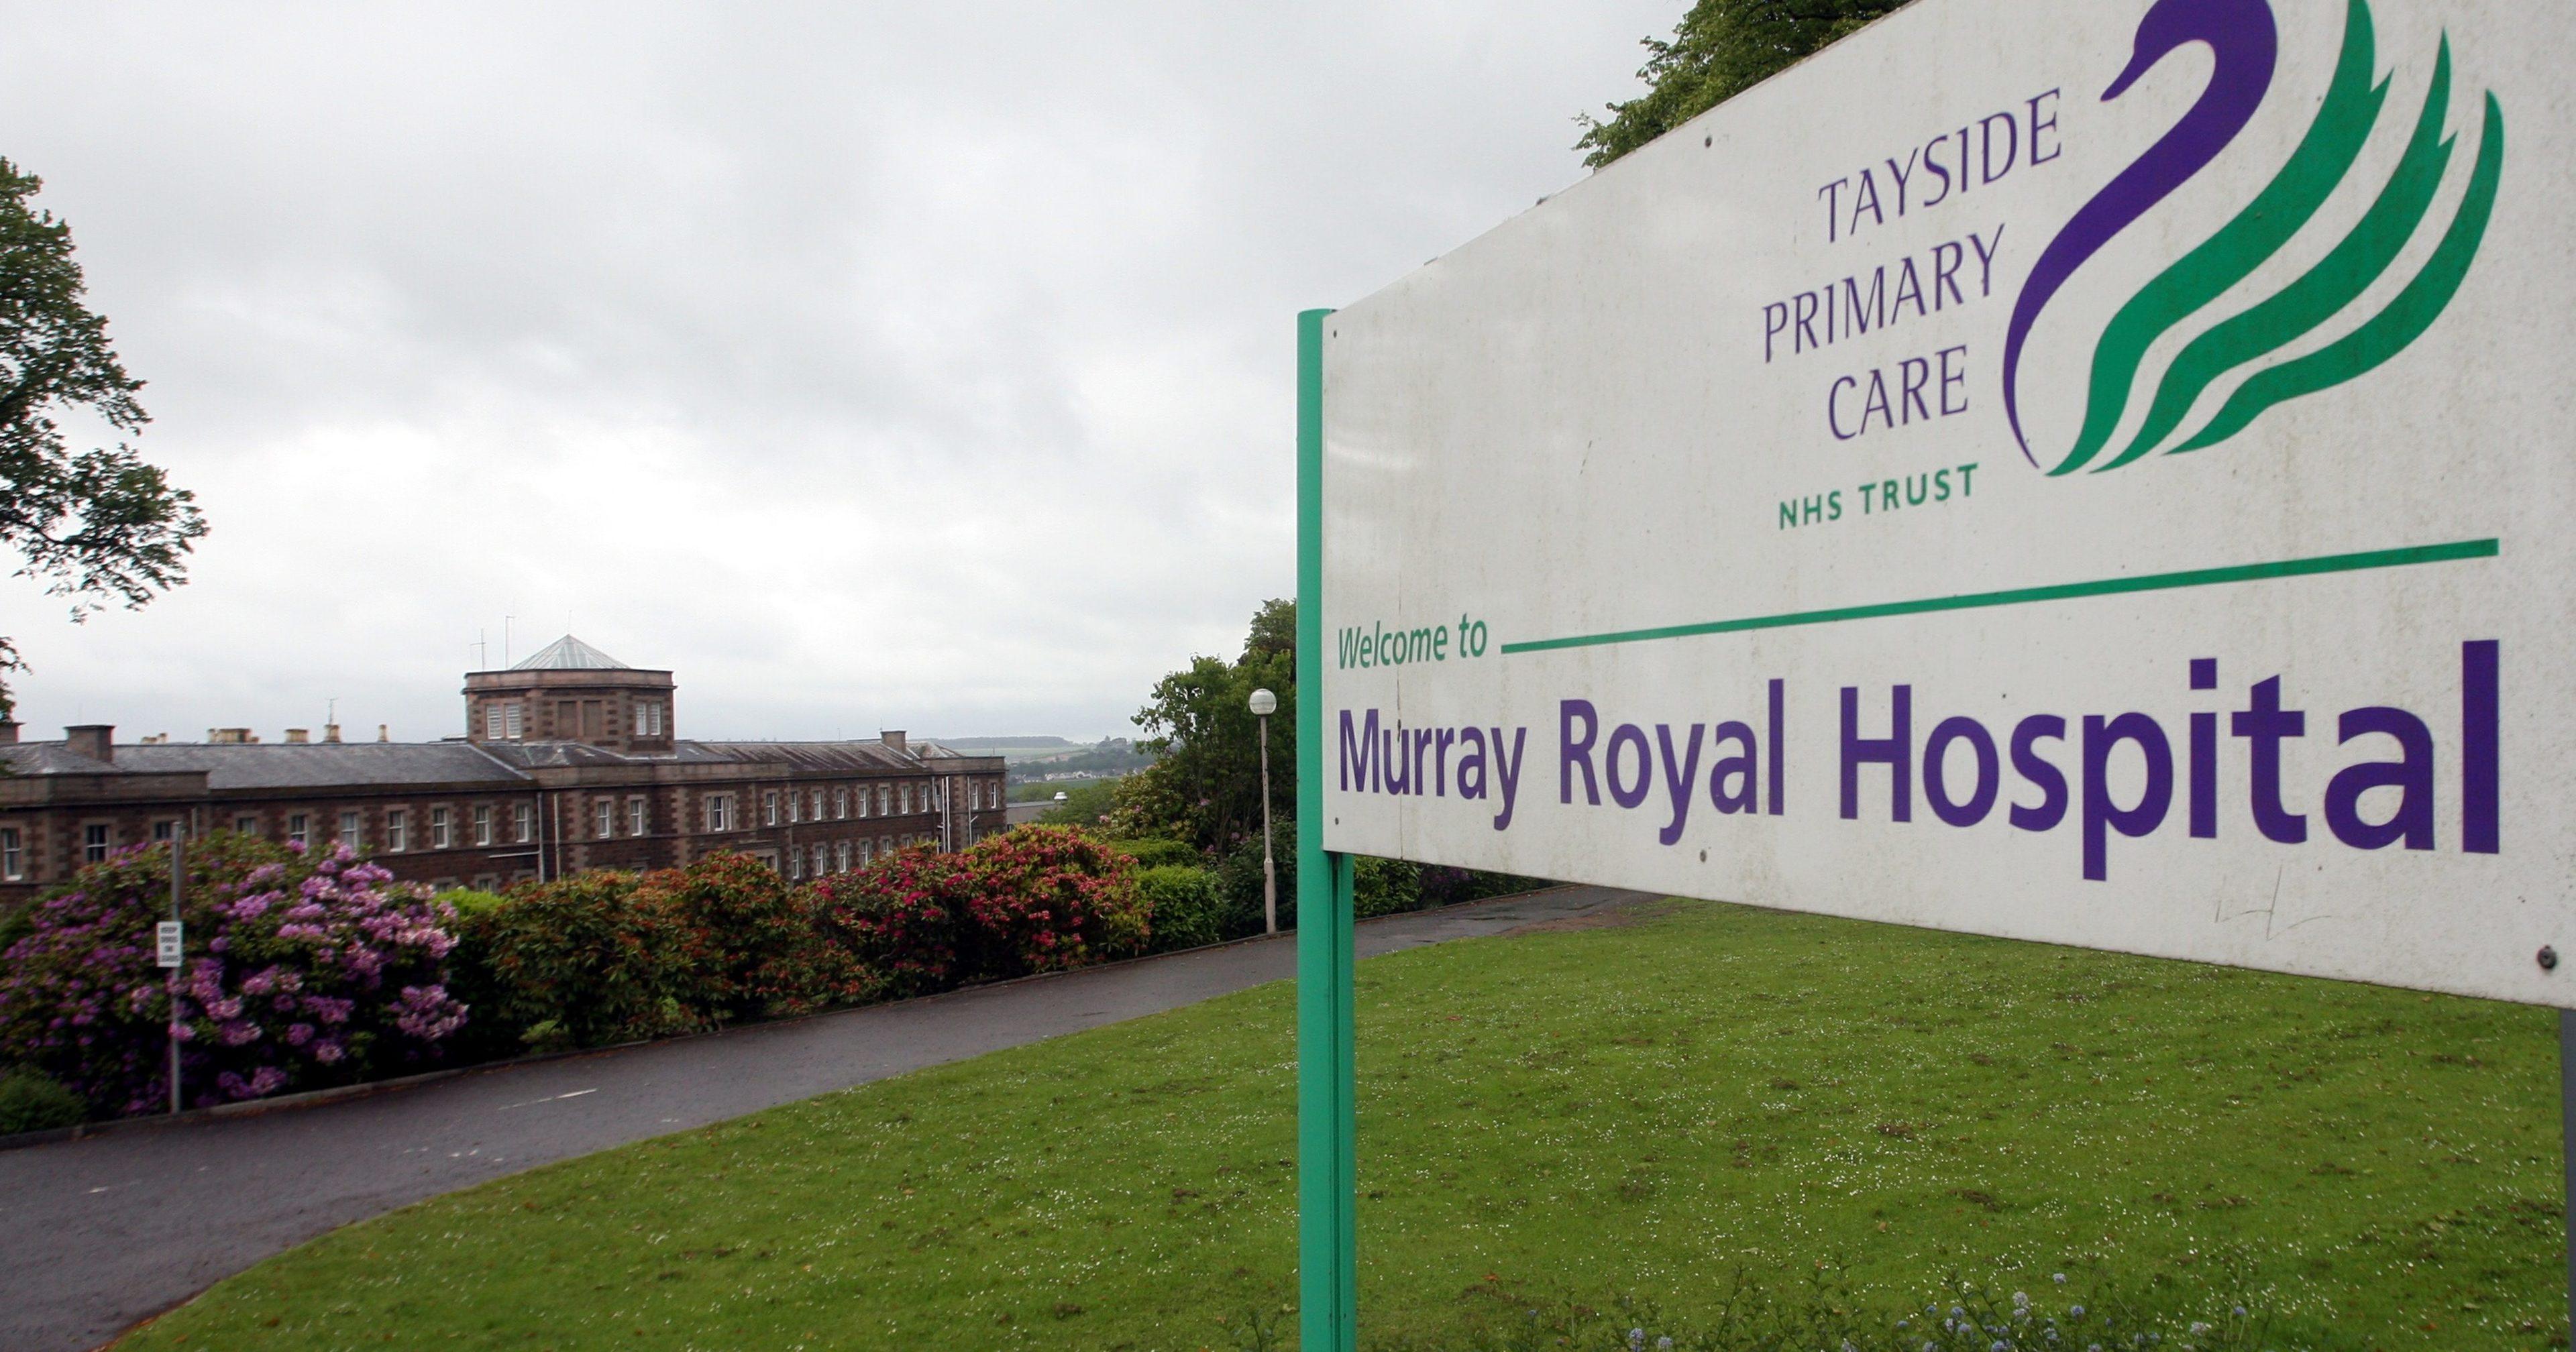 Murray Royal Hospital in Perth.